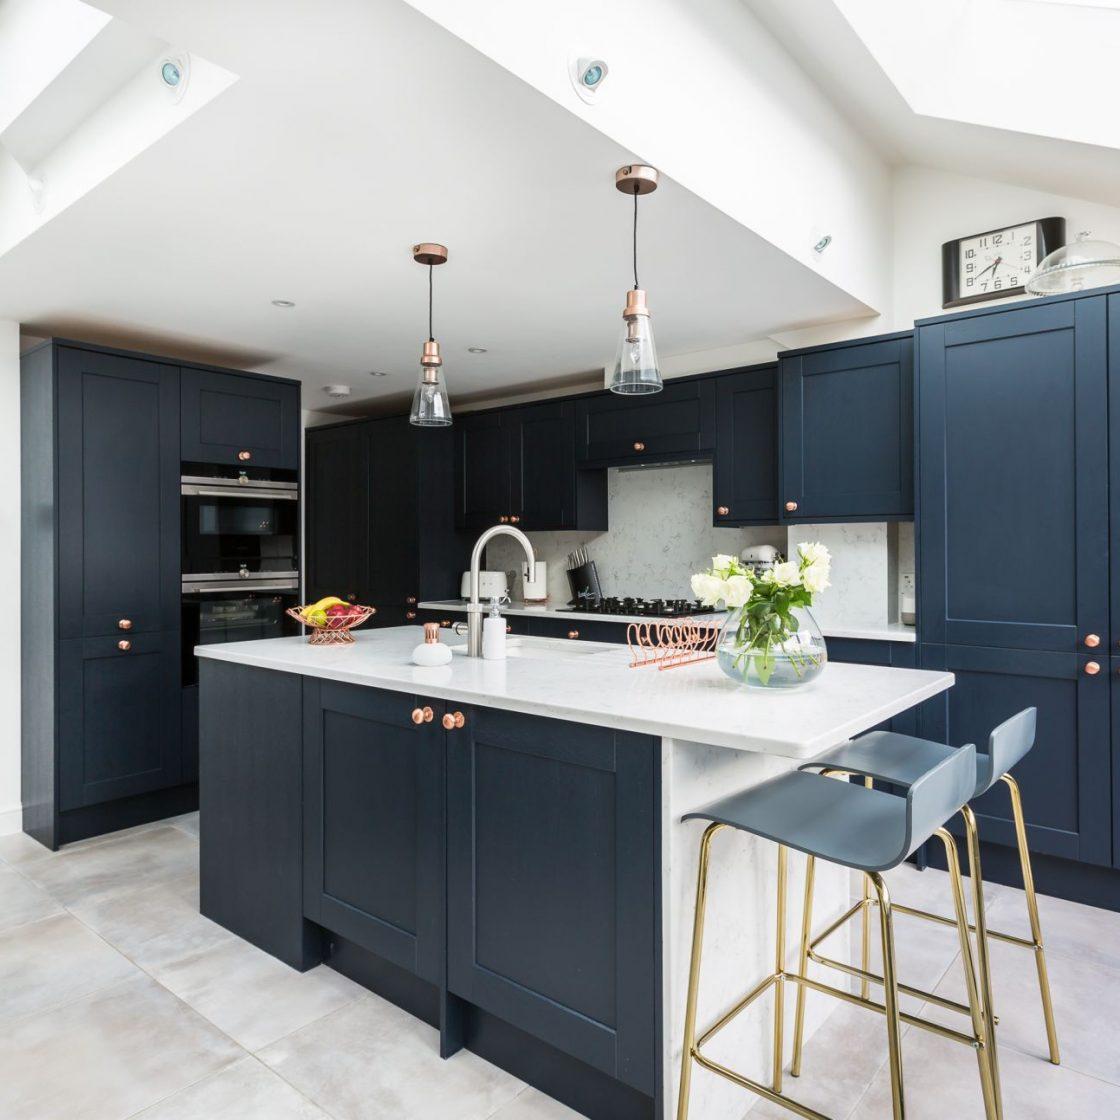 Plus Rooms Kitchen Extension, LandellsRoad, SE22